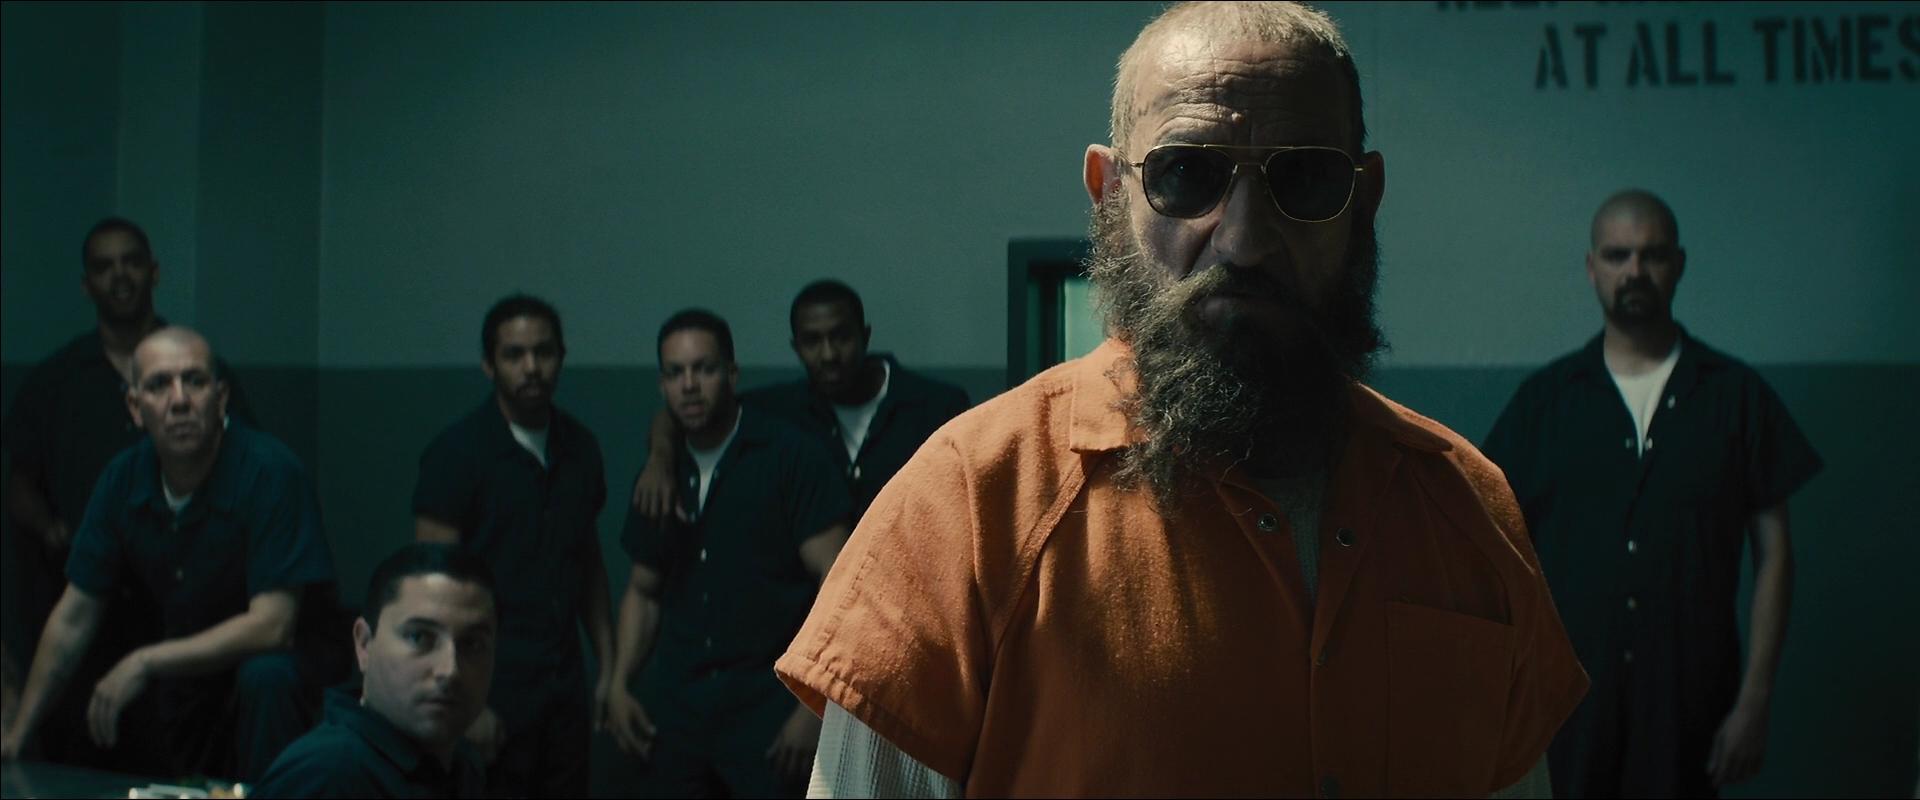 Iron Man 3 director Shane Black does not regret that Mandarin twist one bit